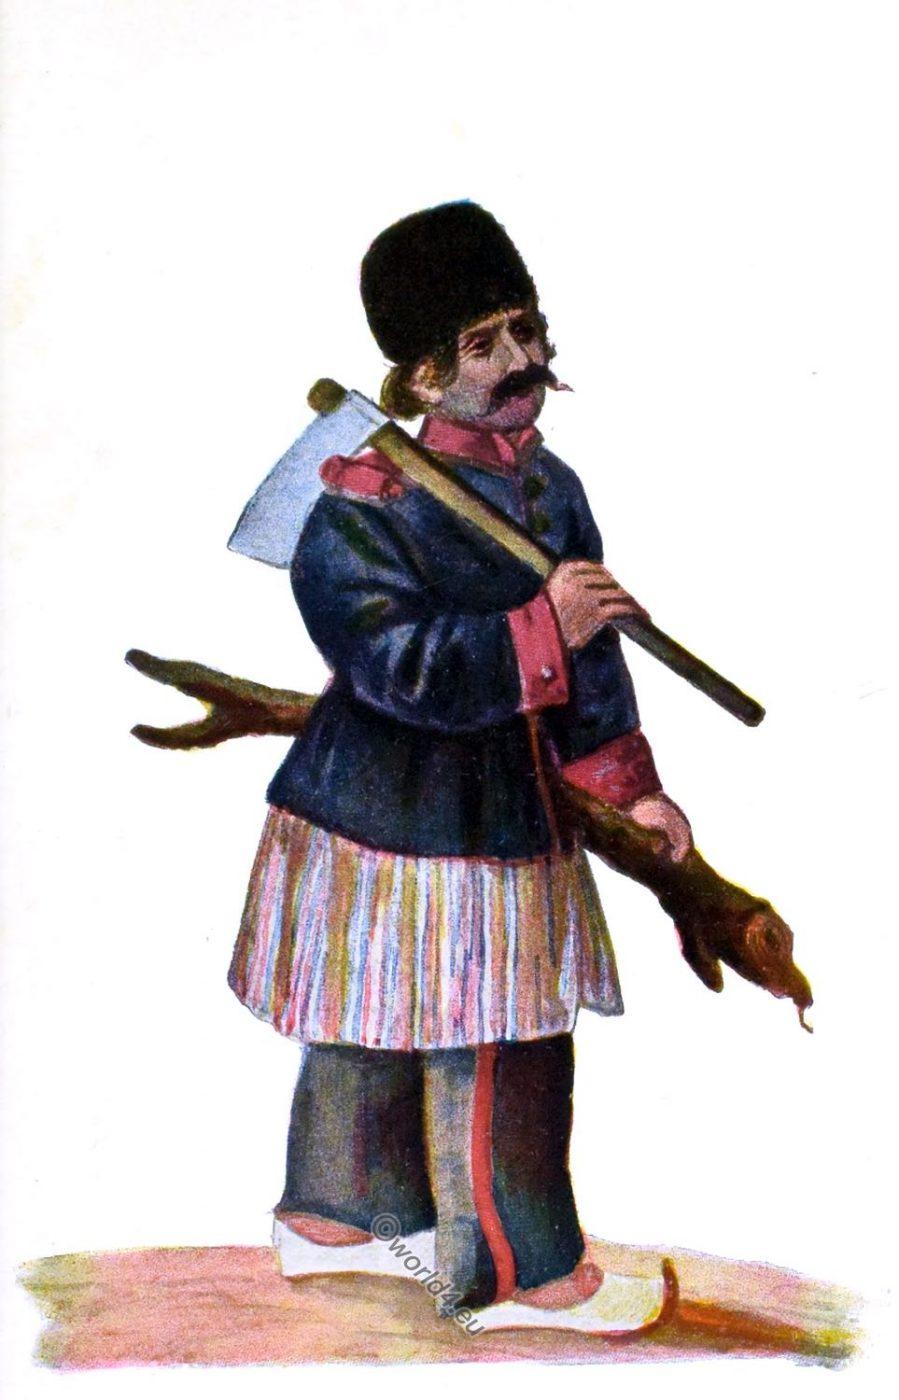 Taghidjan Mazenderani, soldier, woodcutter, Iran, Persia, costume